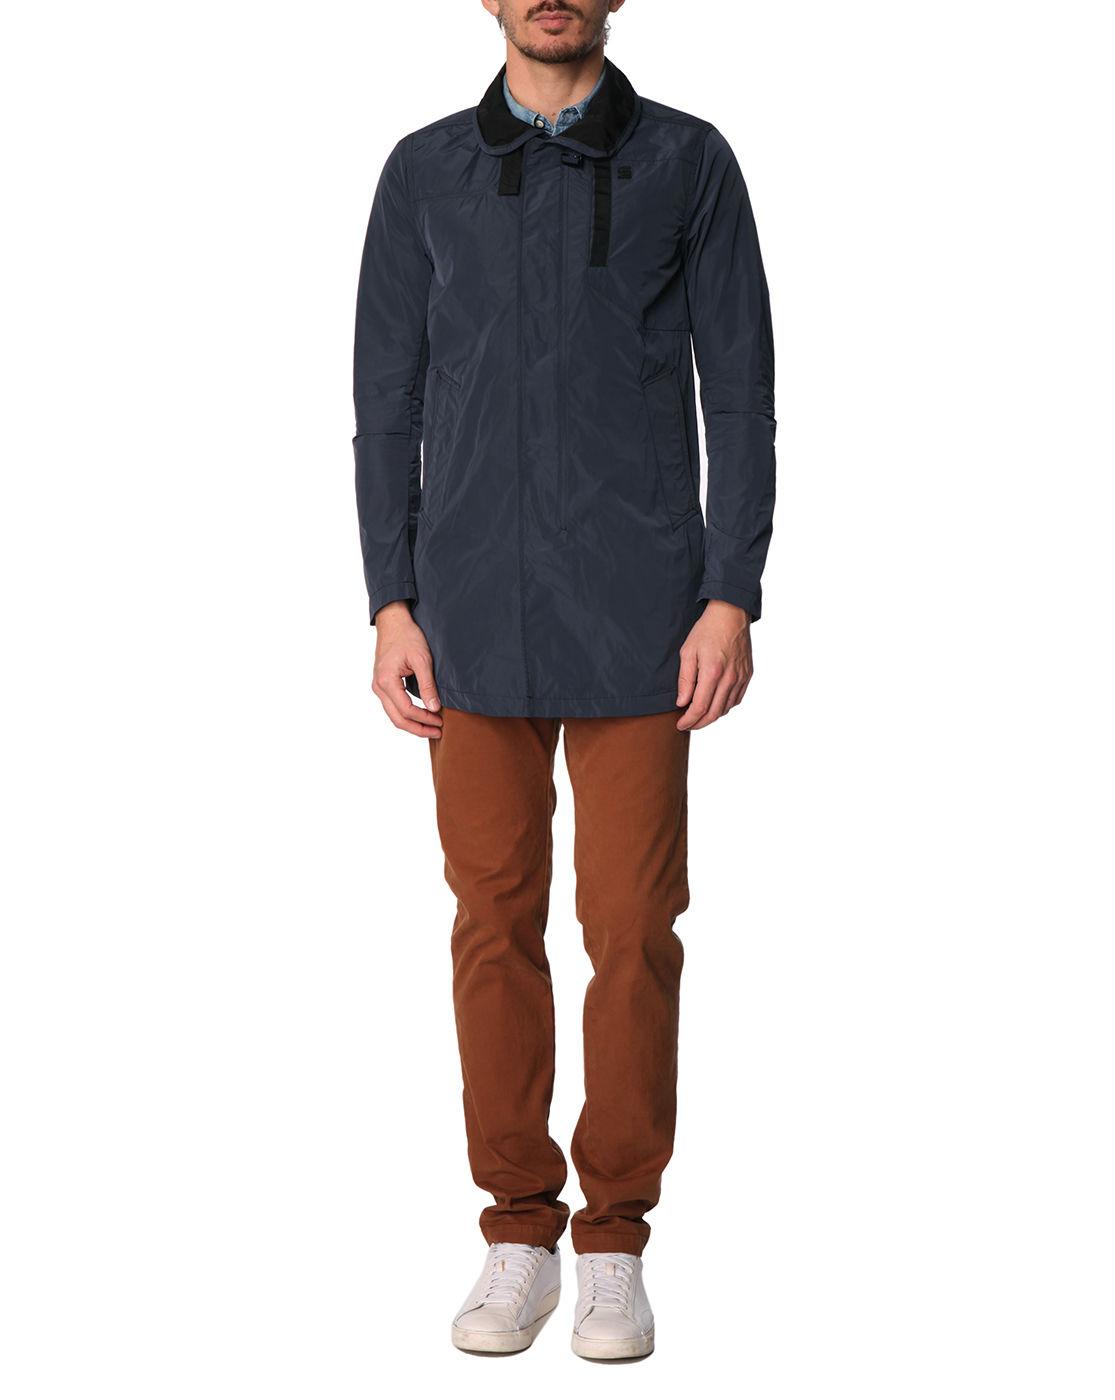 g star raw navy nylon garber trench coat in blue for men navy lyst. Black Bedroom Furniture Sets. Home Design Ideas